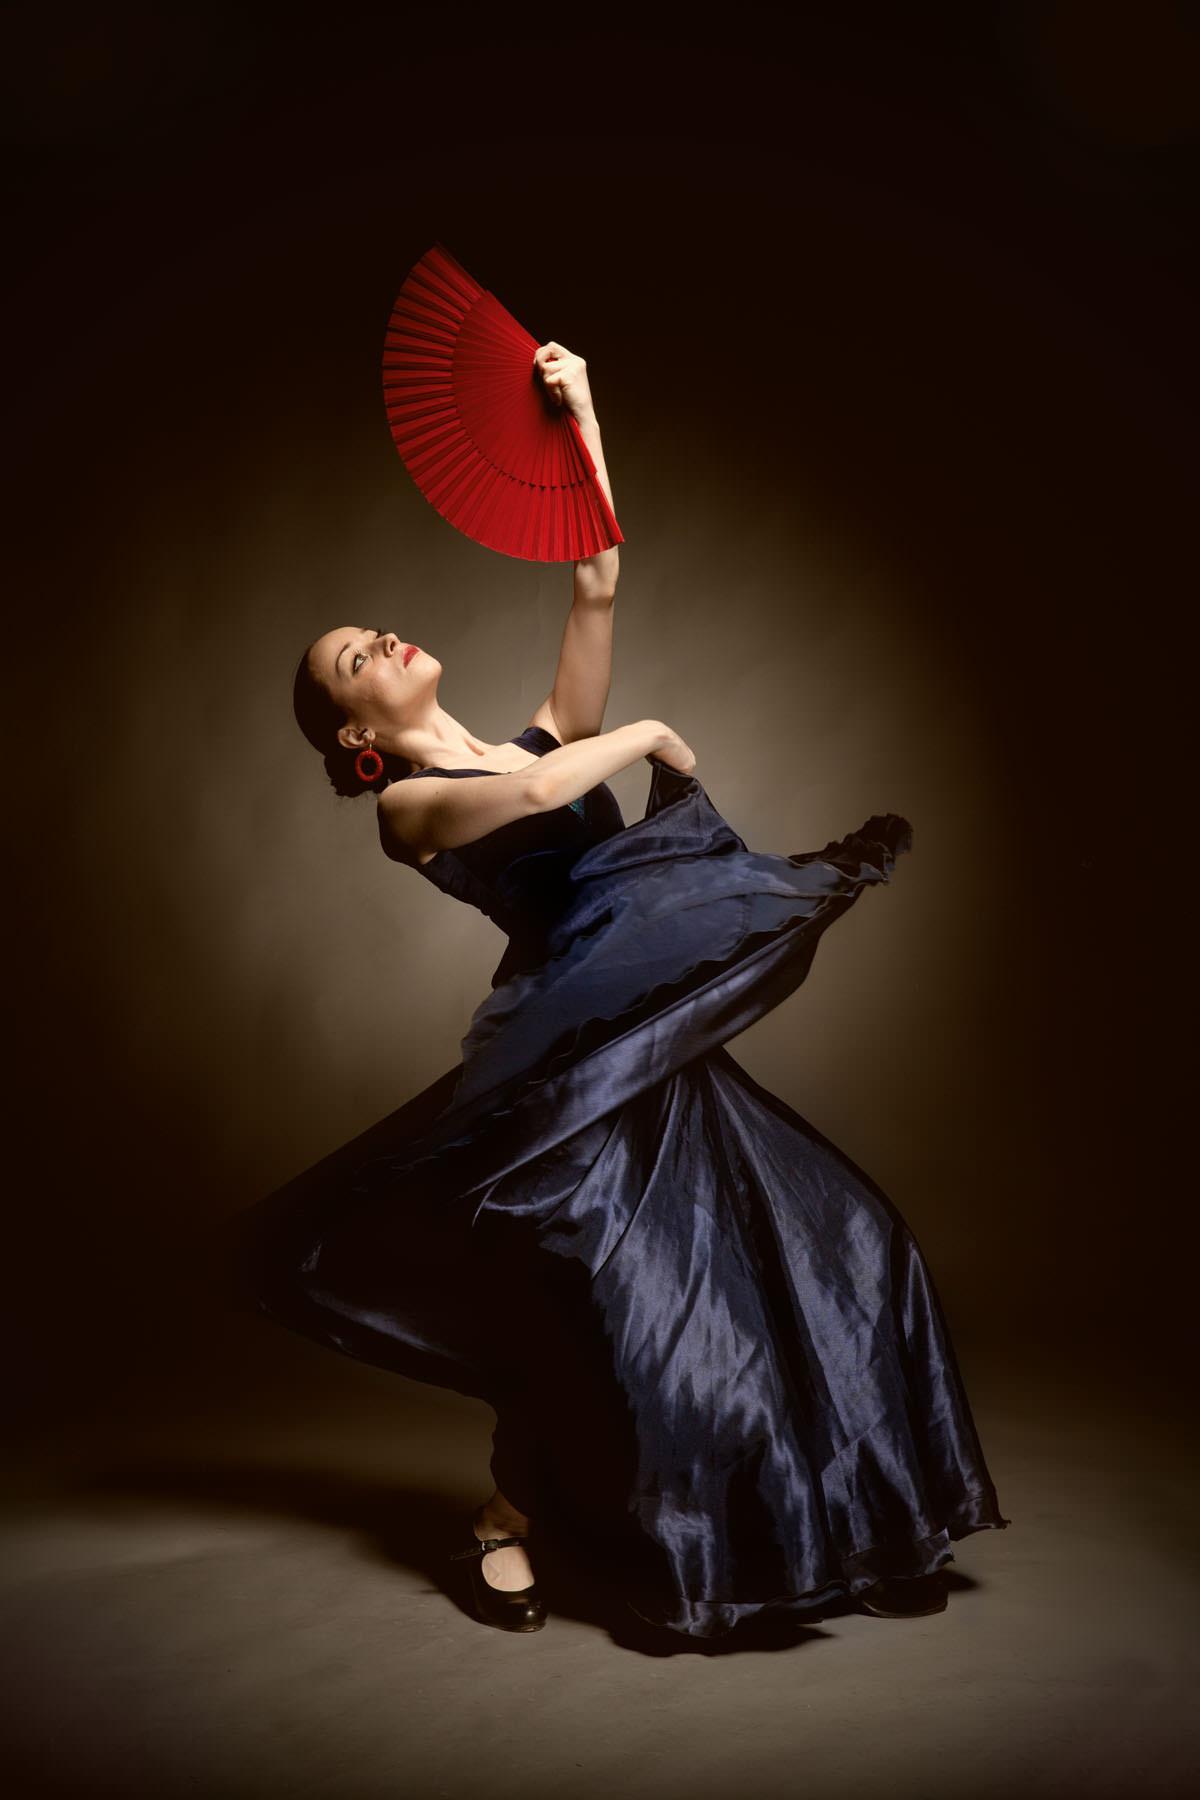 clases-de-flamenco-004